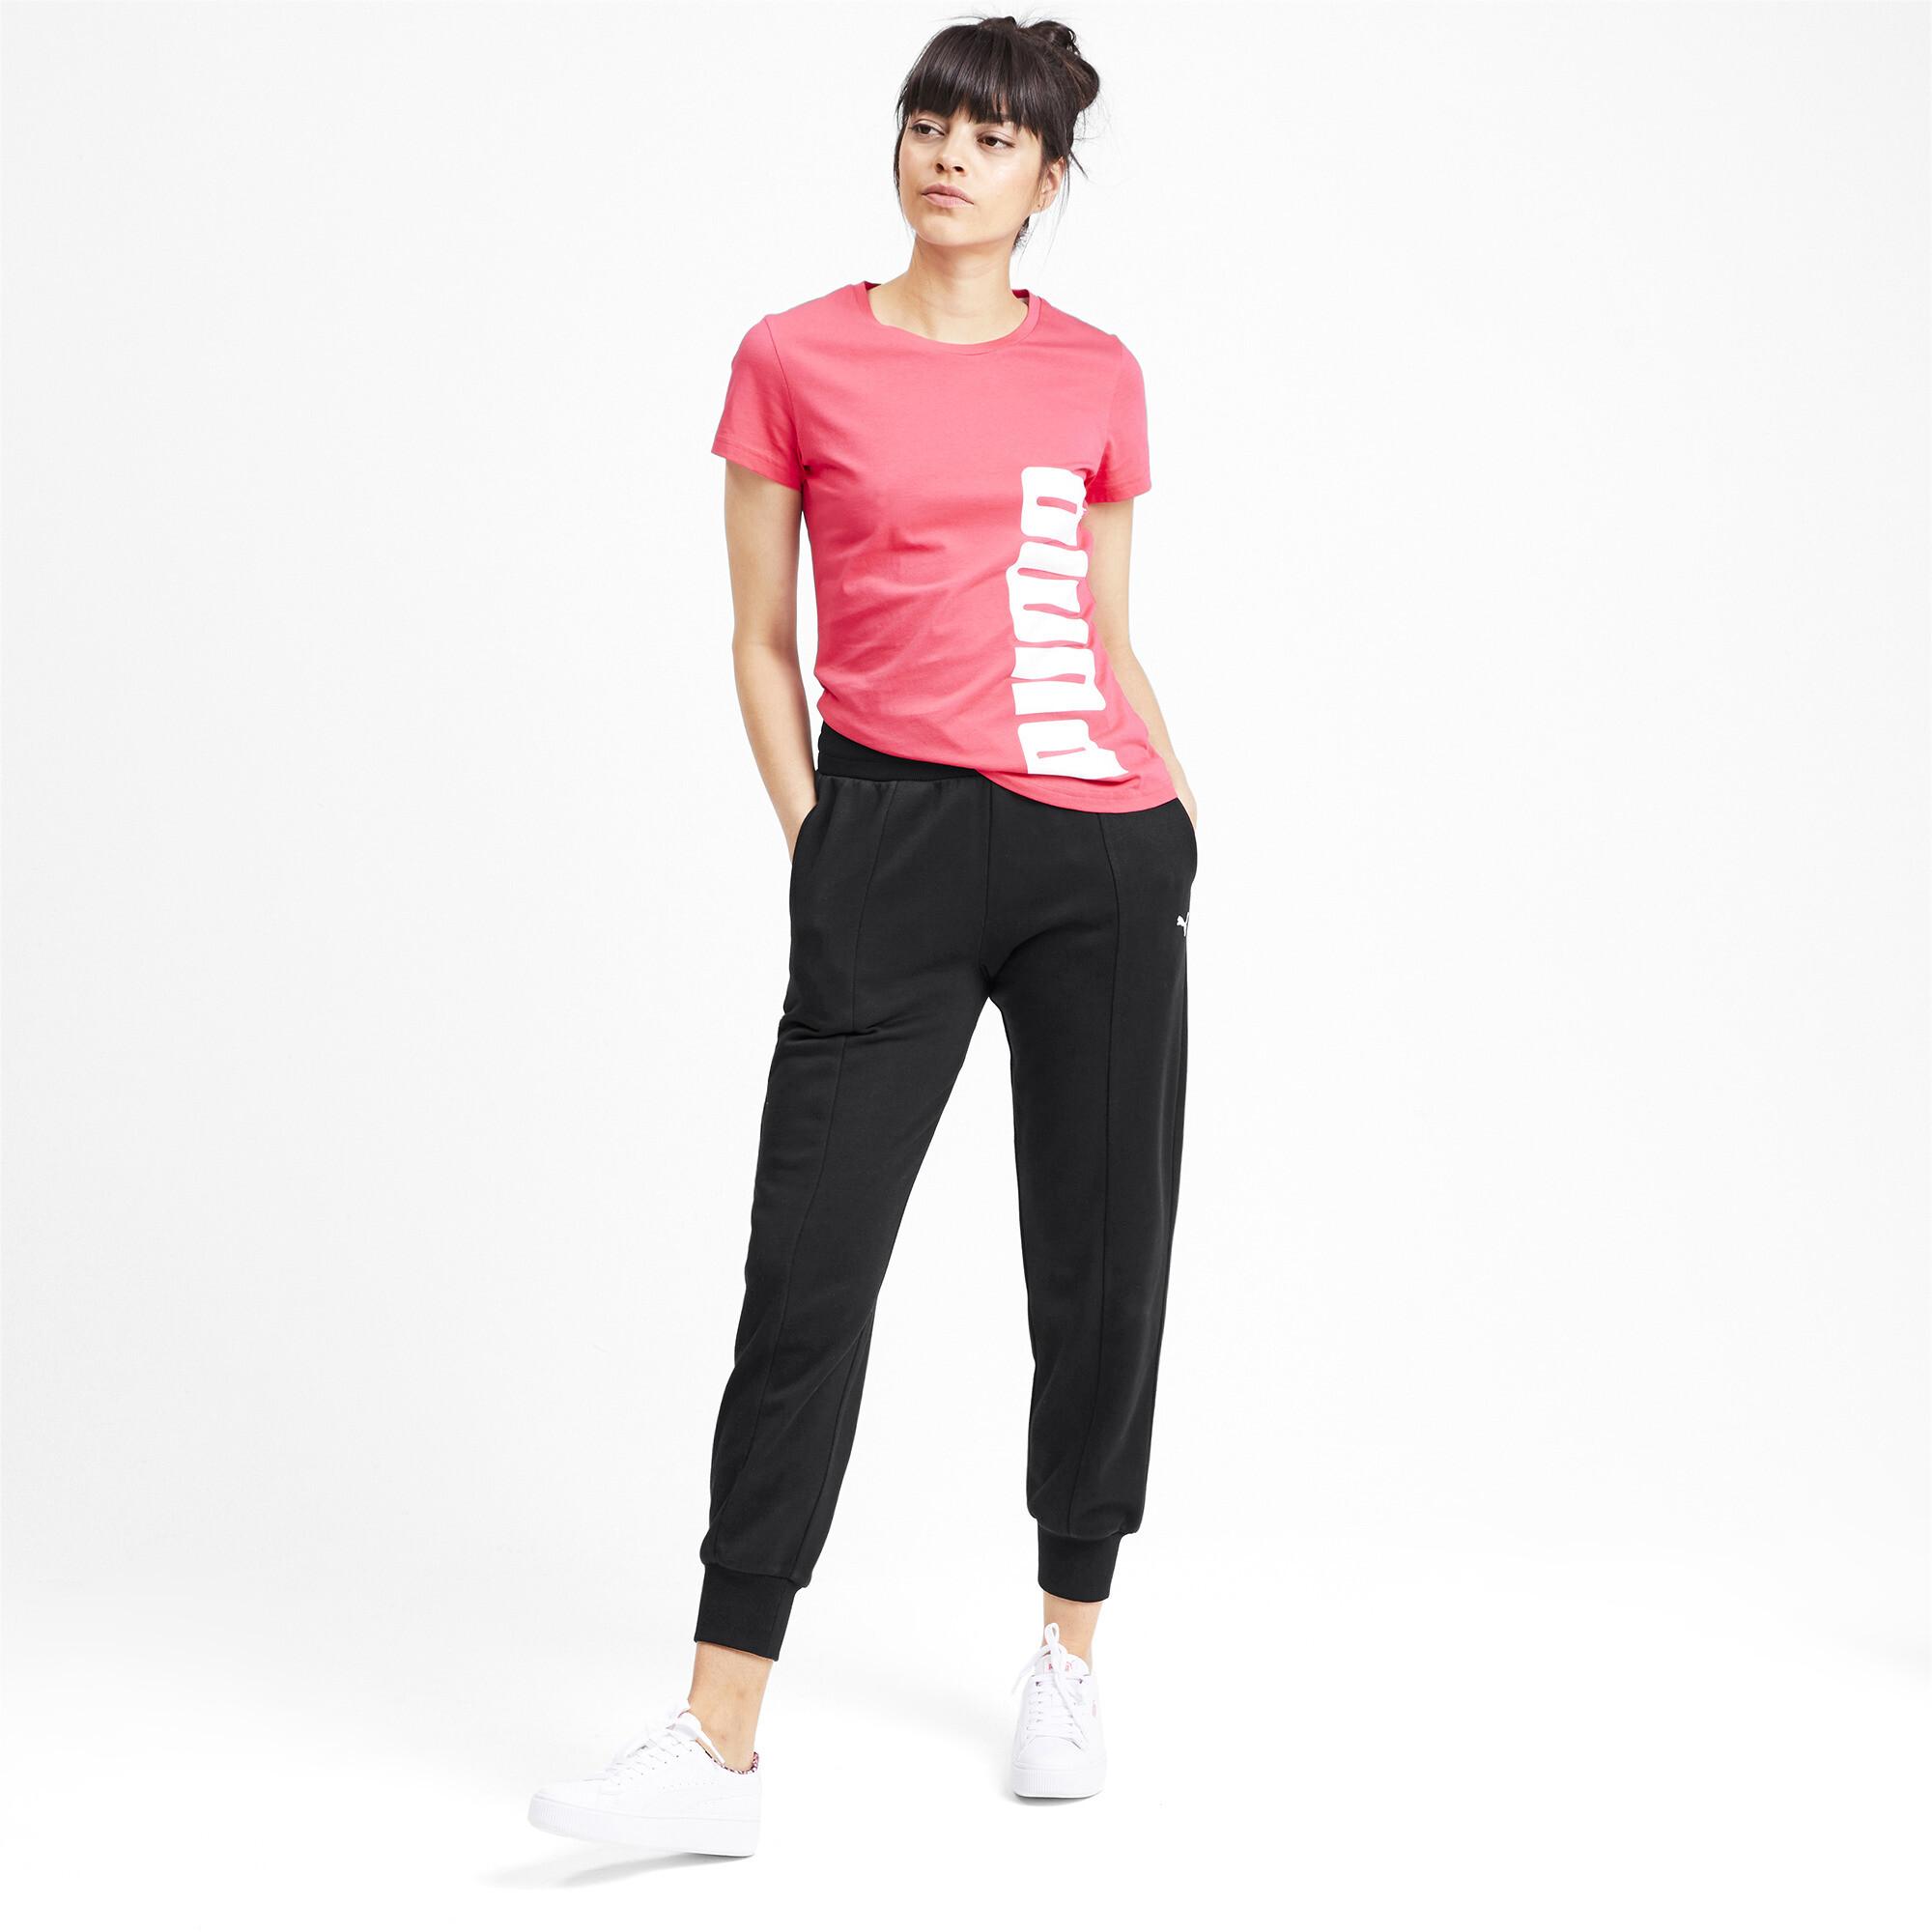 PUMA-Rebel-Women-039-s-Sweatpants-Women-Knitted-Pants-Basics thumbnail 6